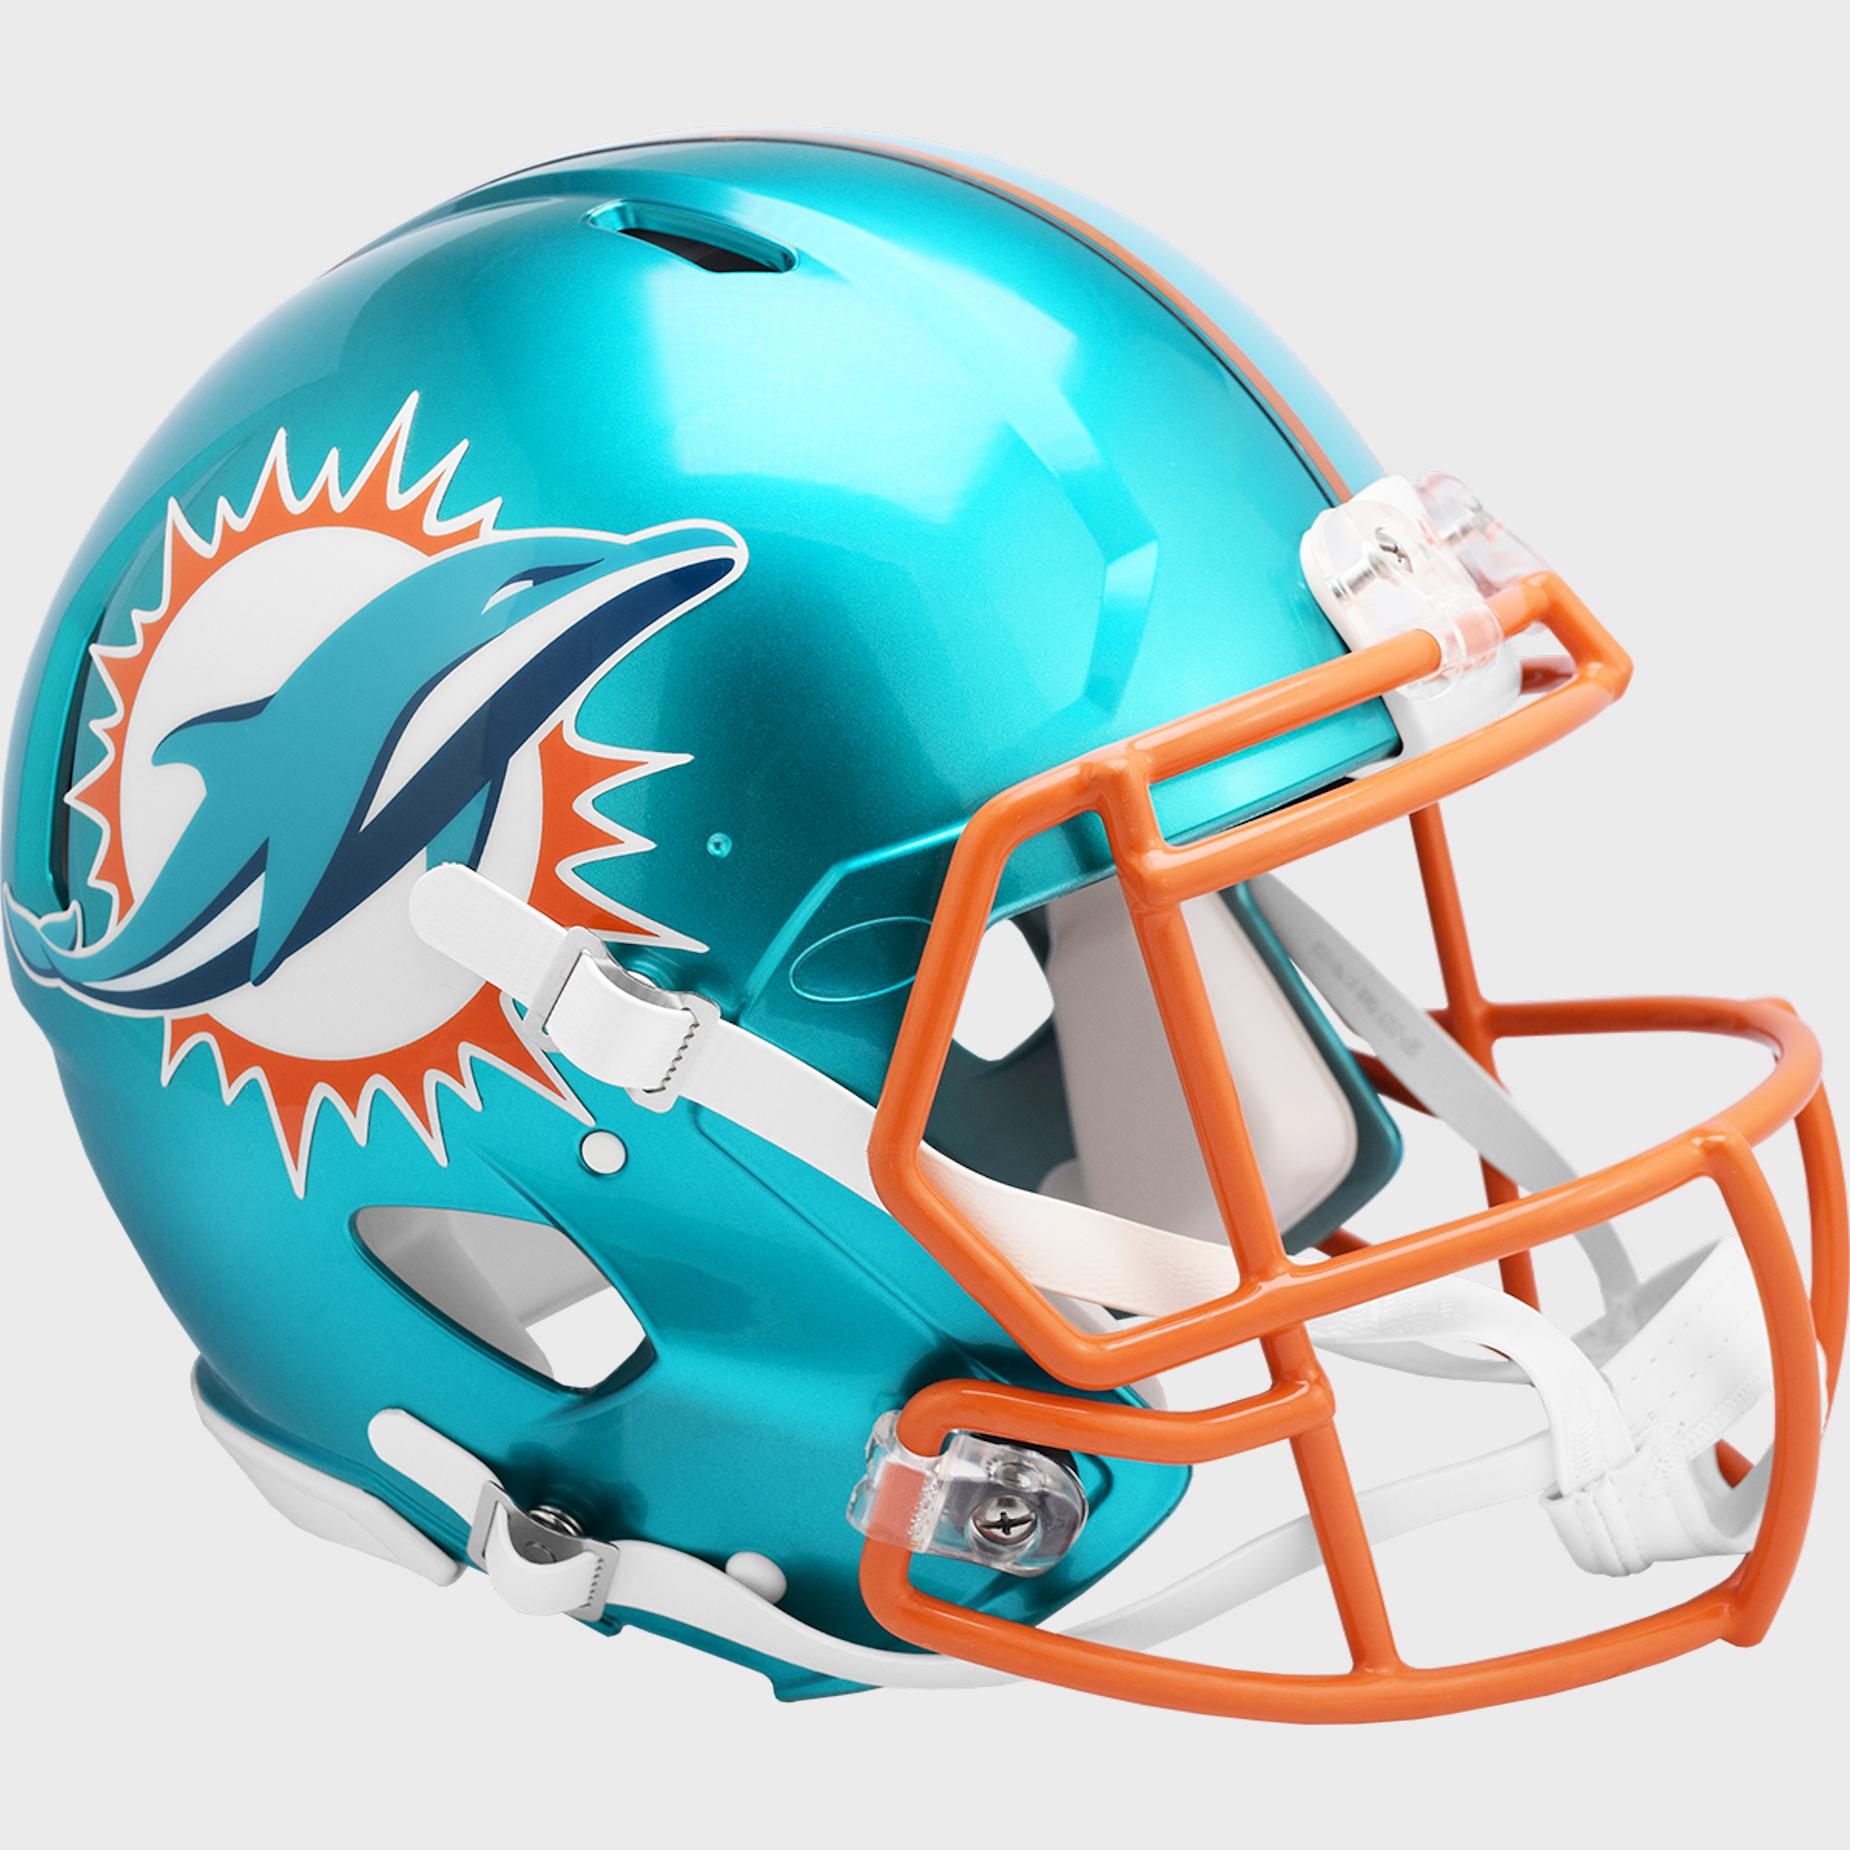 Miami Dolphins Speed Football Helmet <B>FLASH ESD 8/21/21</B>